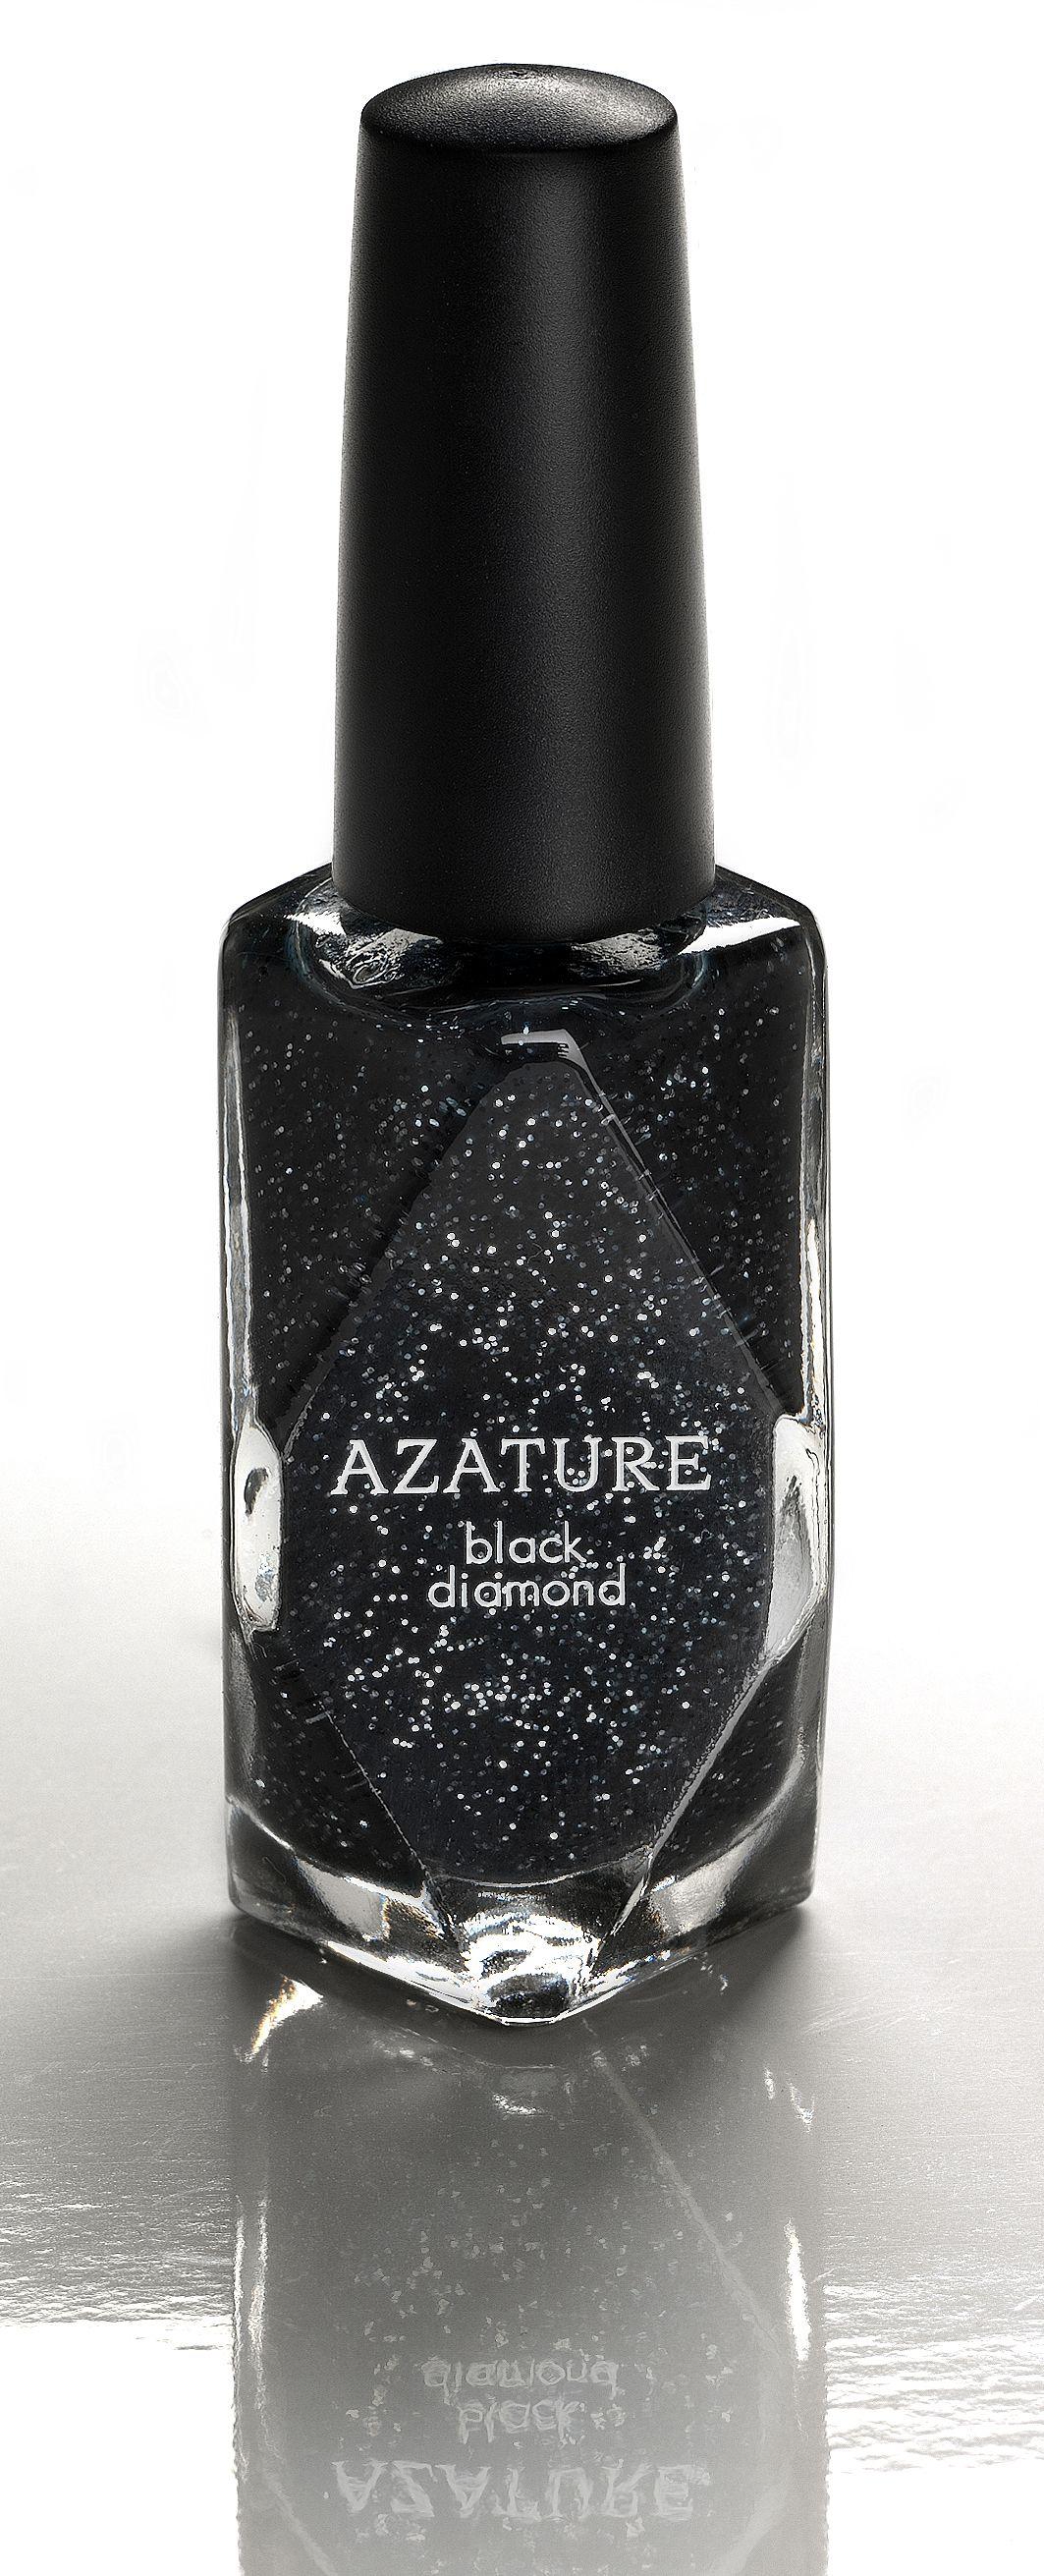 Now You Can Buy a $250,000 Nail Polish | Black diamonds, Kelly ...